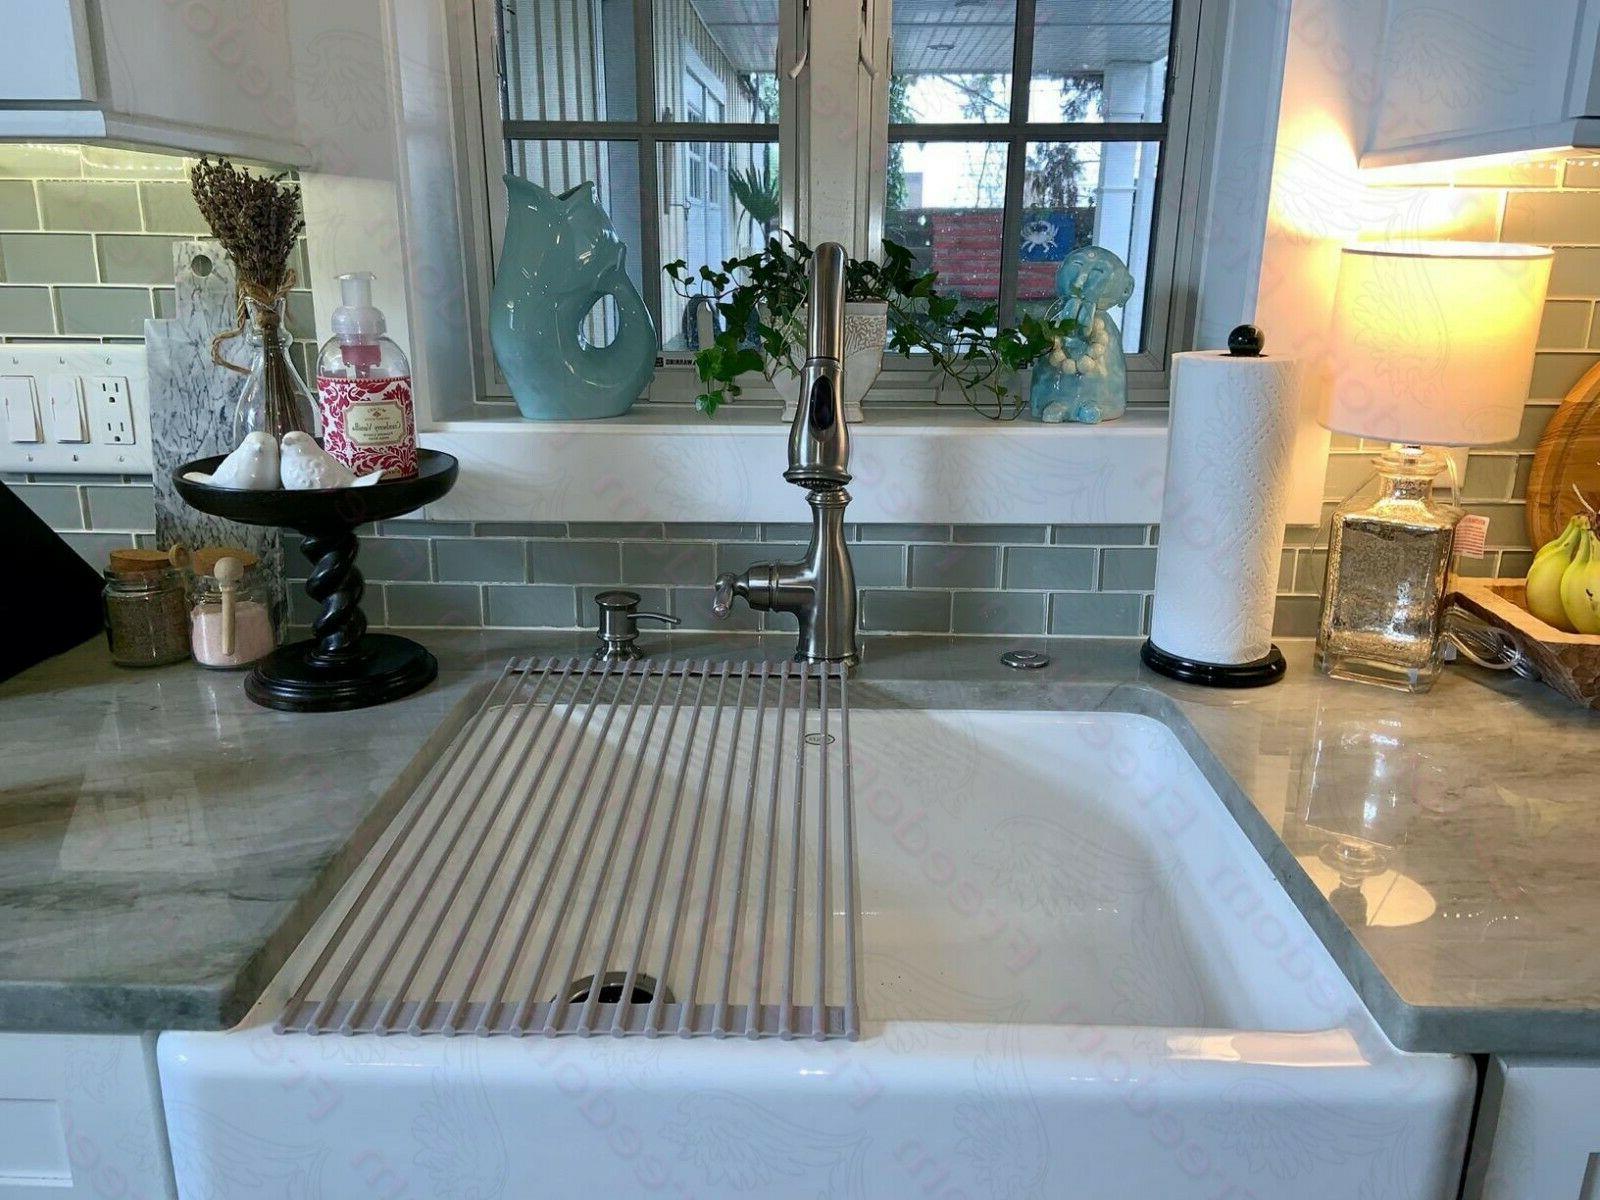 Surpahs Over Sink Multipurpose Dish Drying Rack